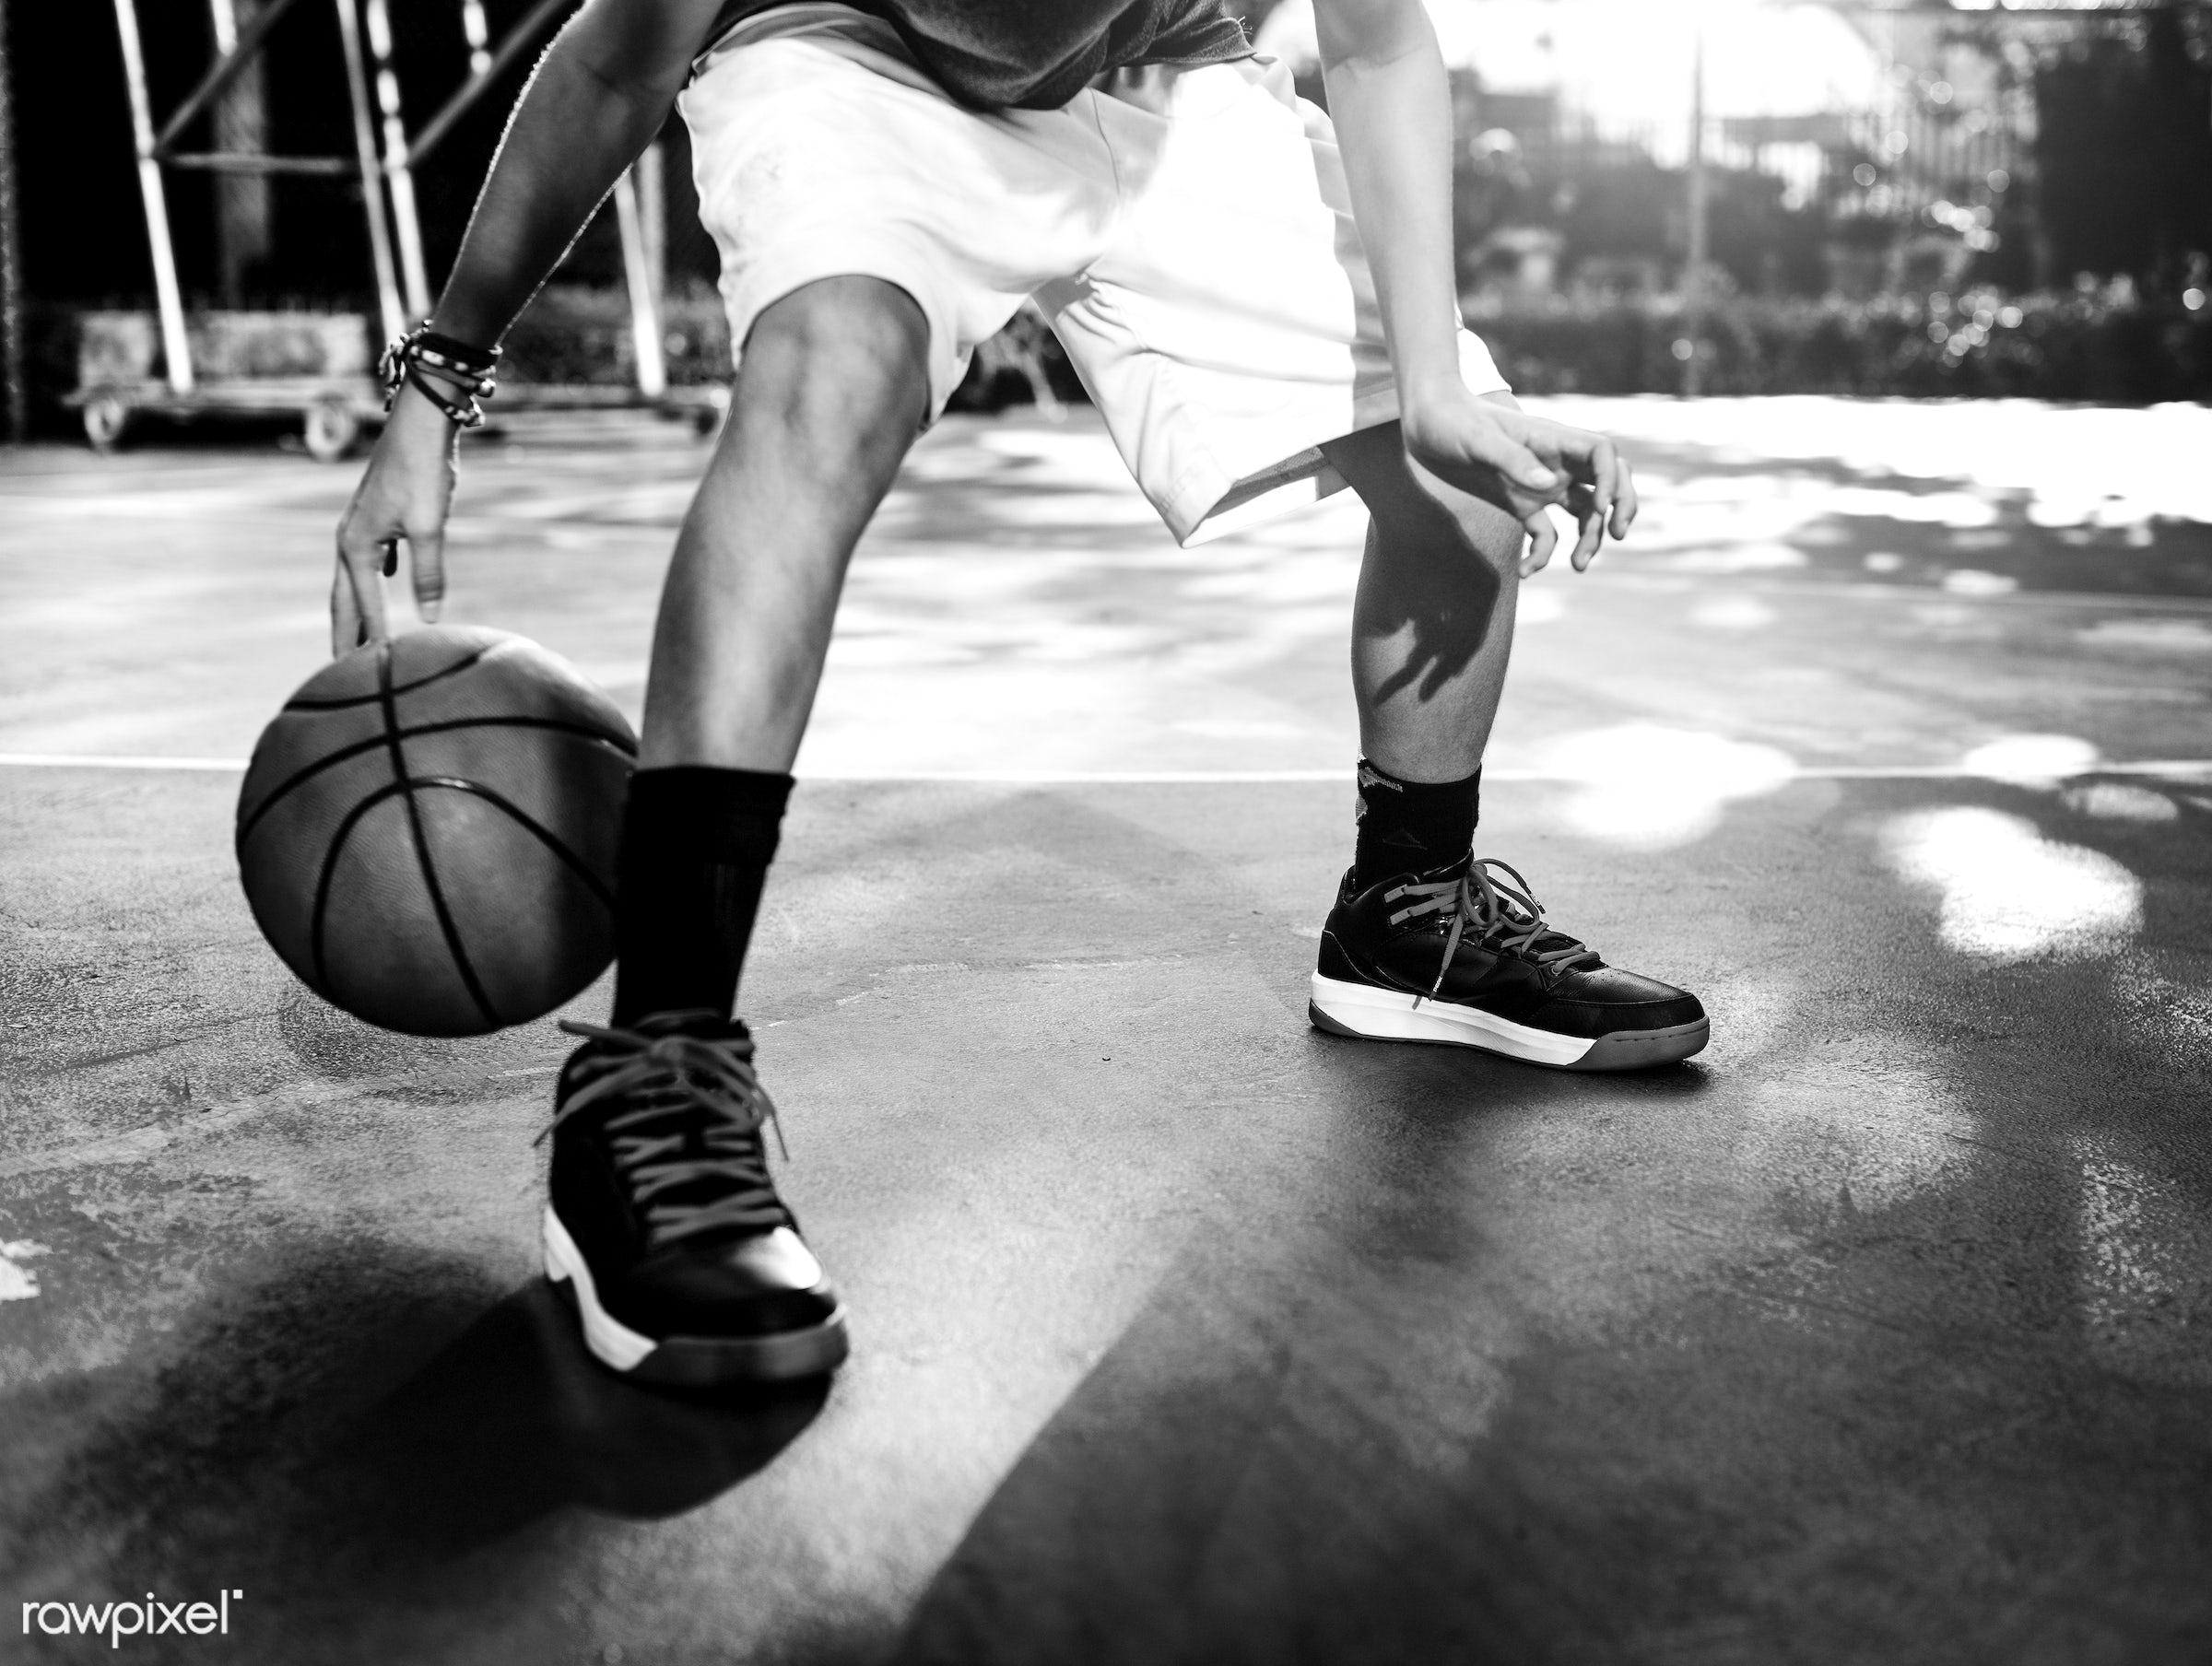 Young basketball player shoot - basketball, activity, ball, boy, exercise, game, man, play, player, practice, sport,...